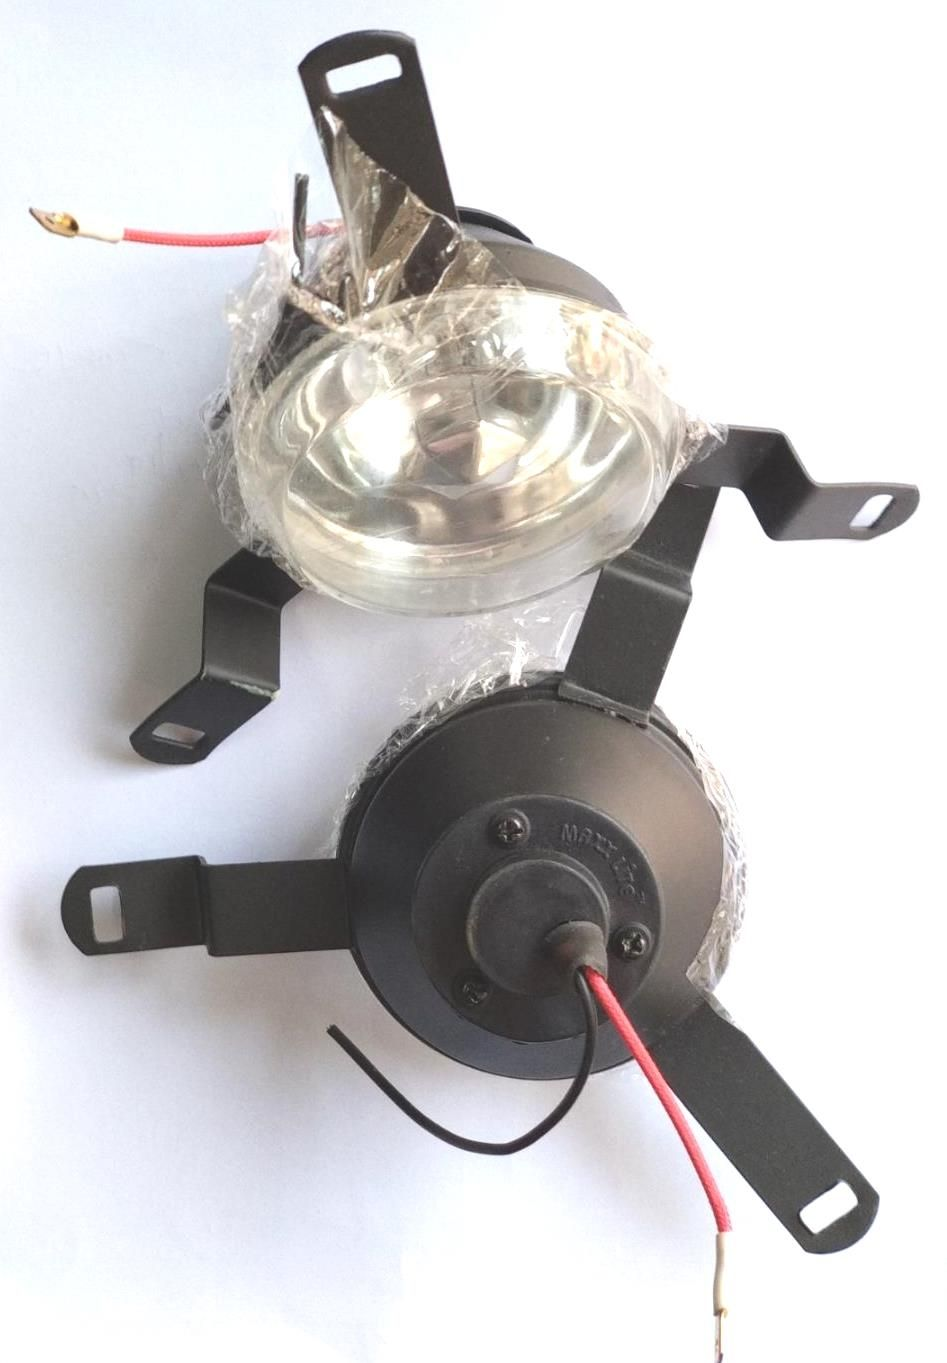 FOG LAMP FOR CHEVROLET TAVERA NEO TYPE II (ROUND TYPE) (SET OF 2PCS)